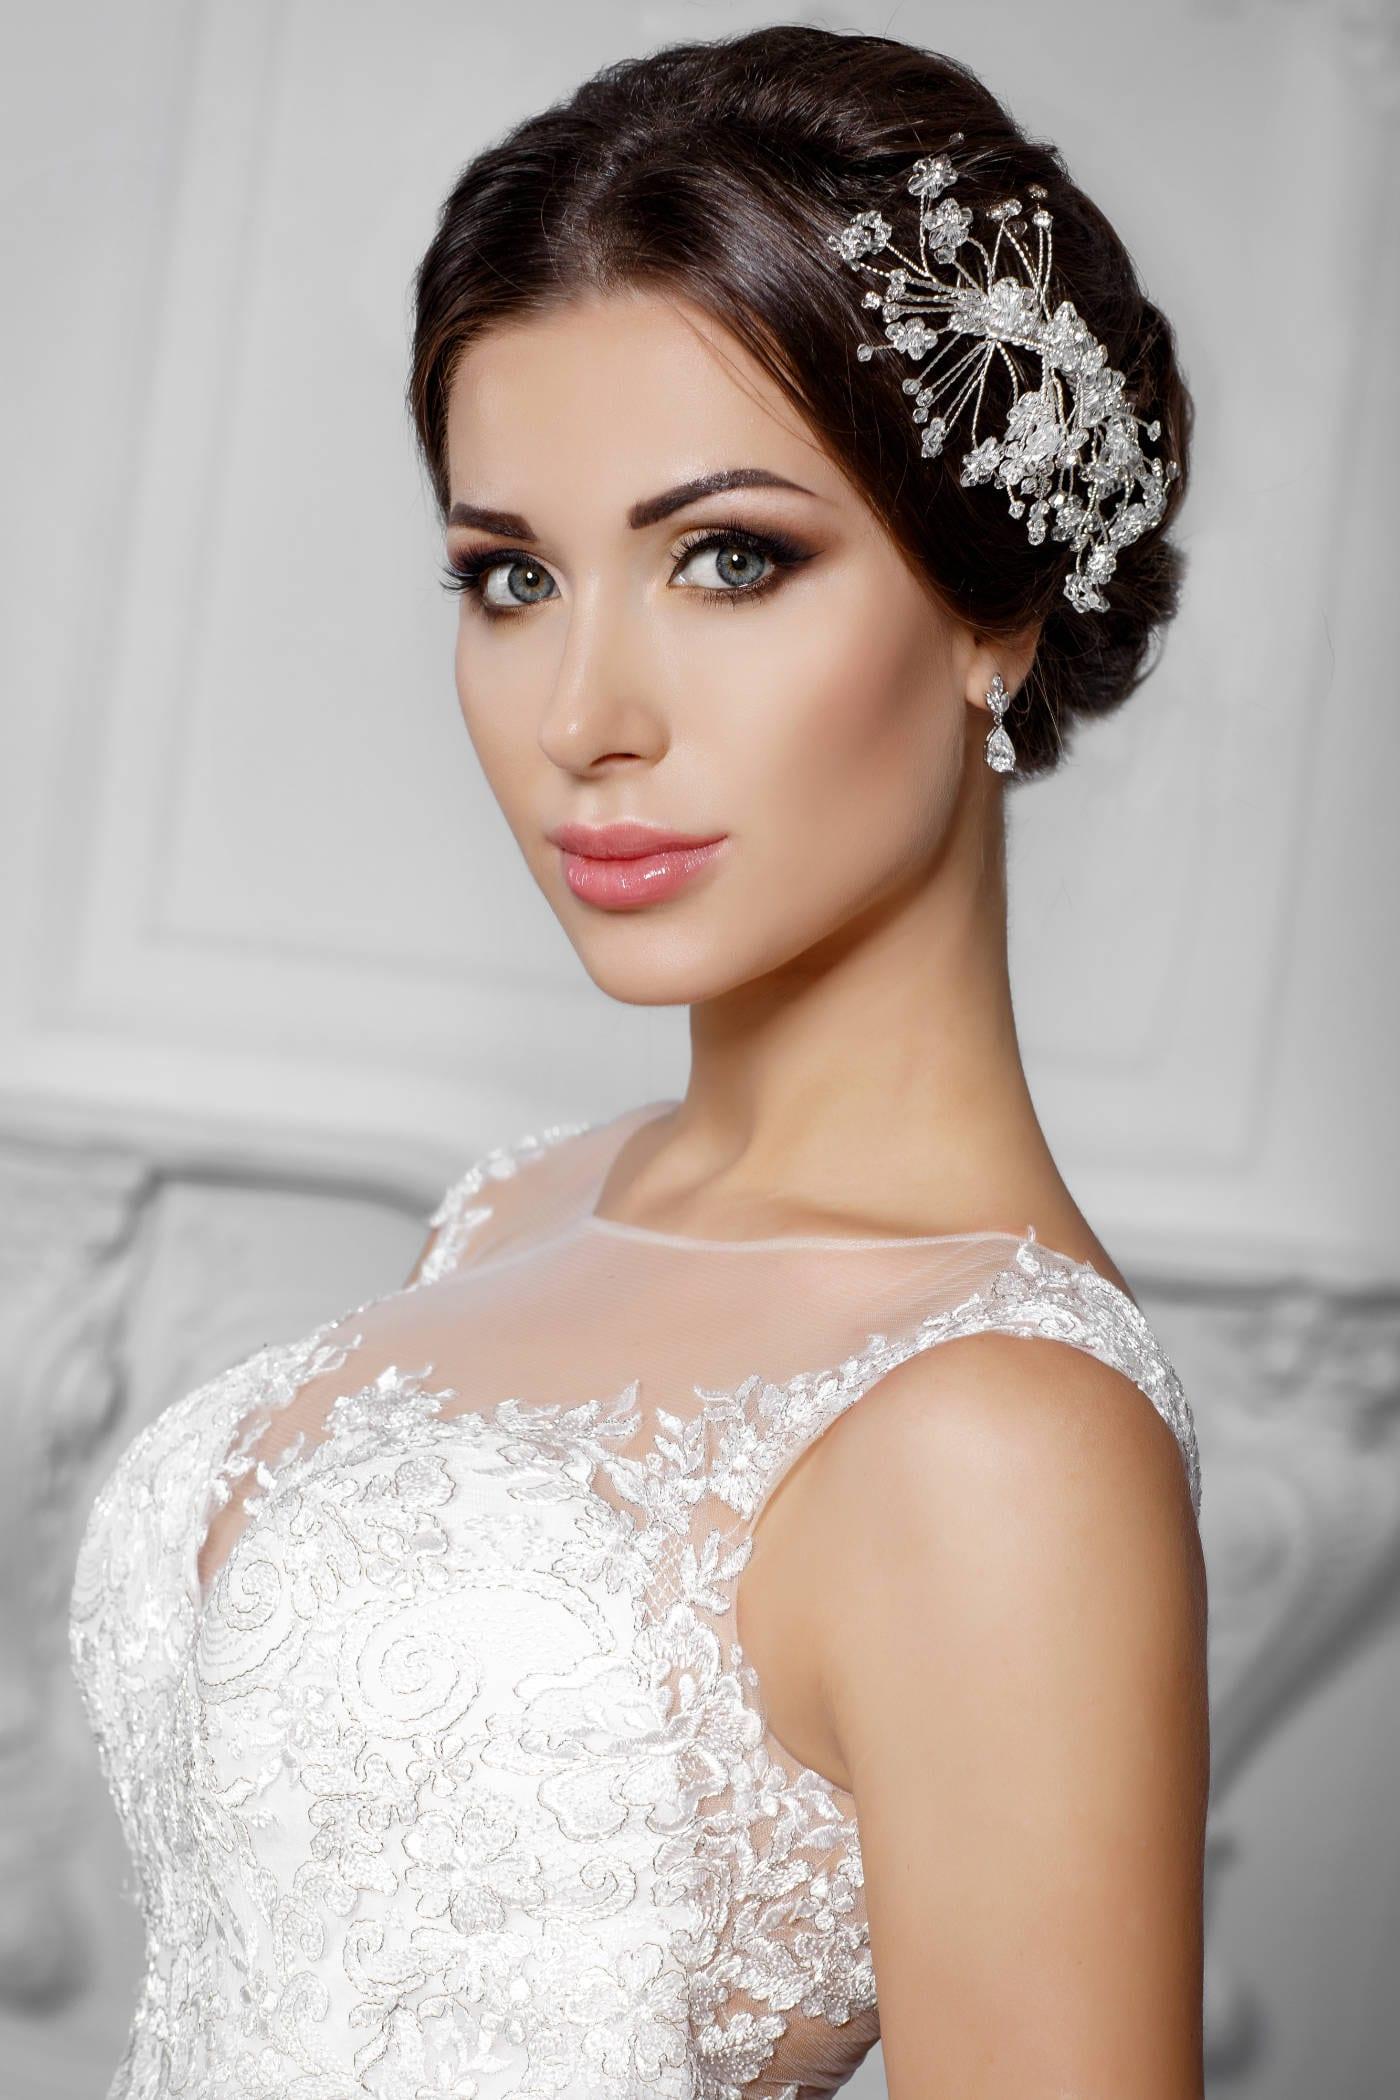 Bridal-Makeup-artist-Hertfordshire-2